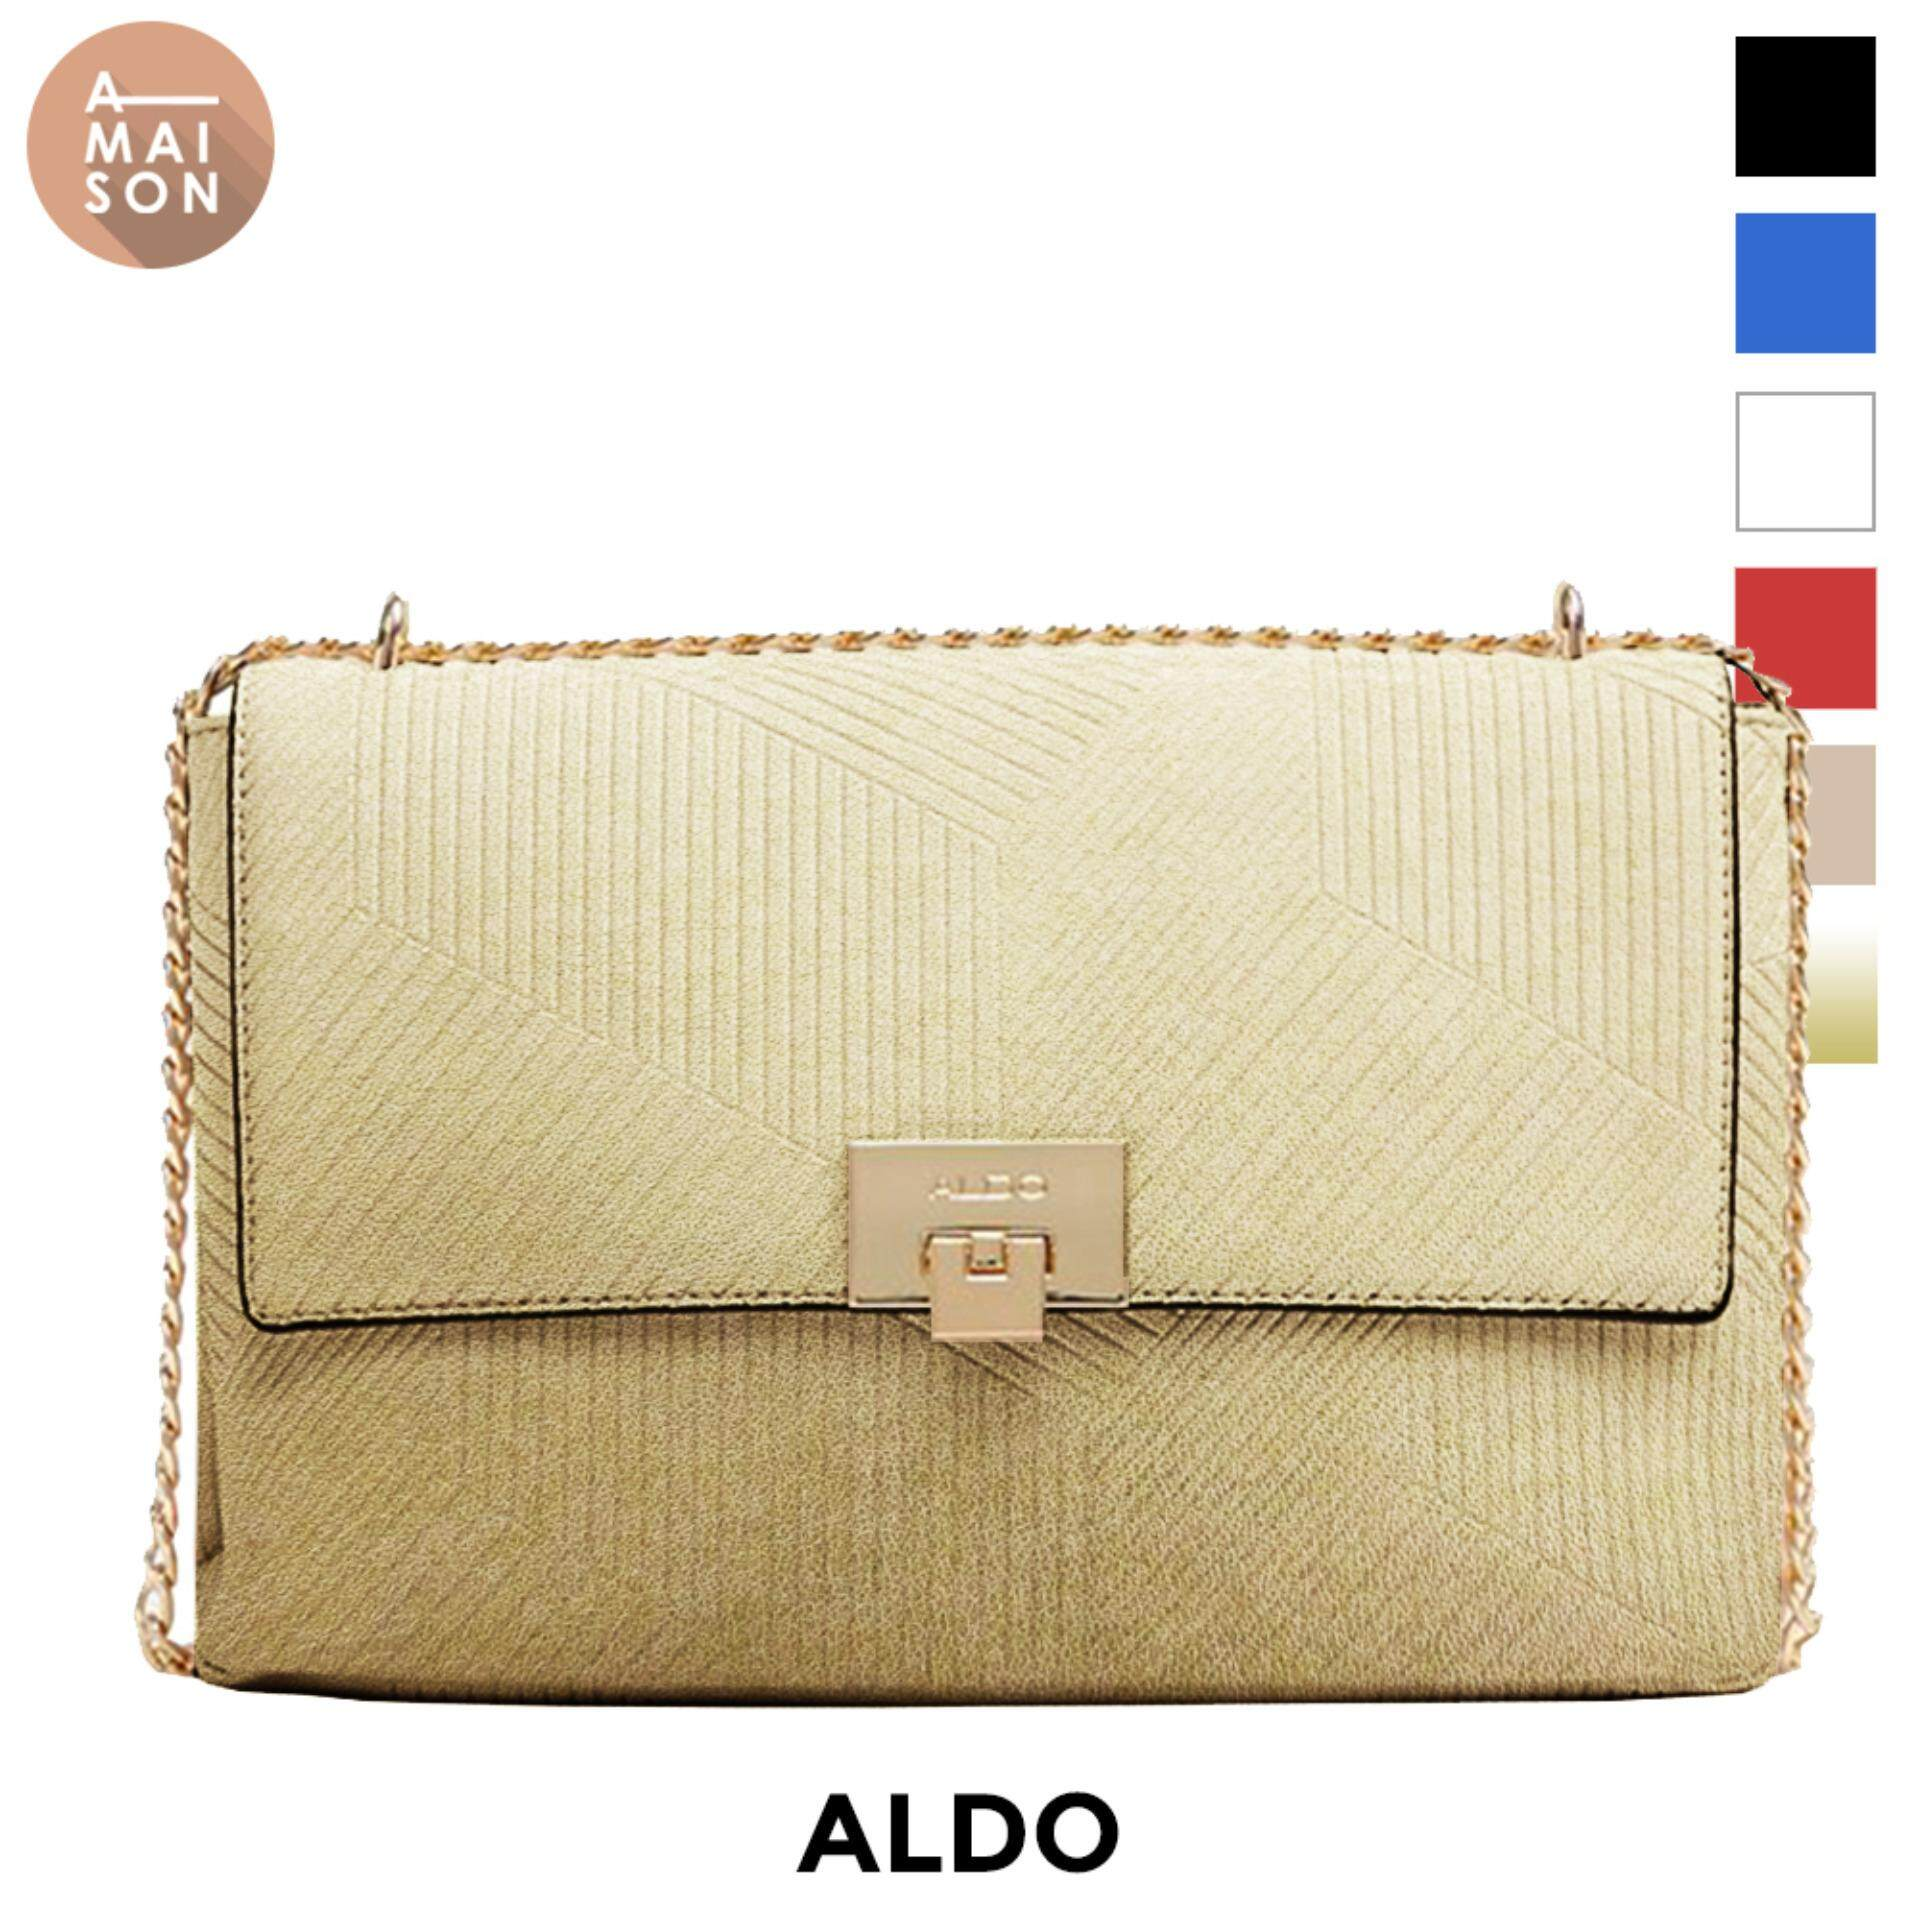 1b2daad6f77 Authentic Aldo Fair Textured Elegant Keylock Closure Evening Crossbody  Messenger Sling Shoulder Bag Handbag